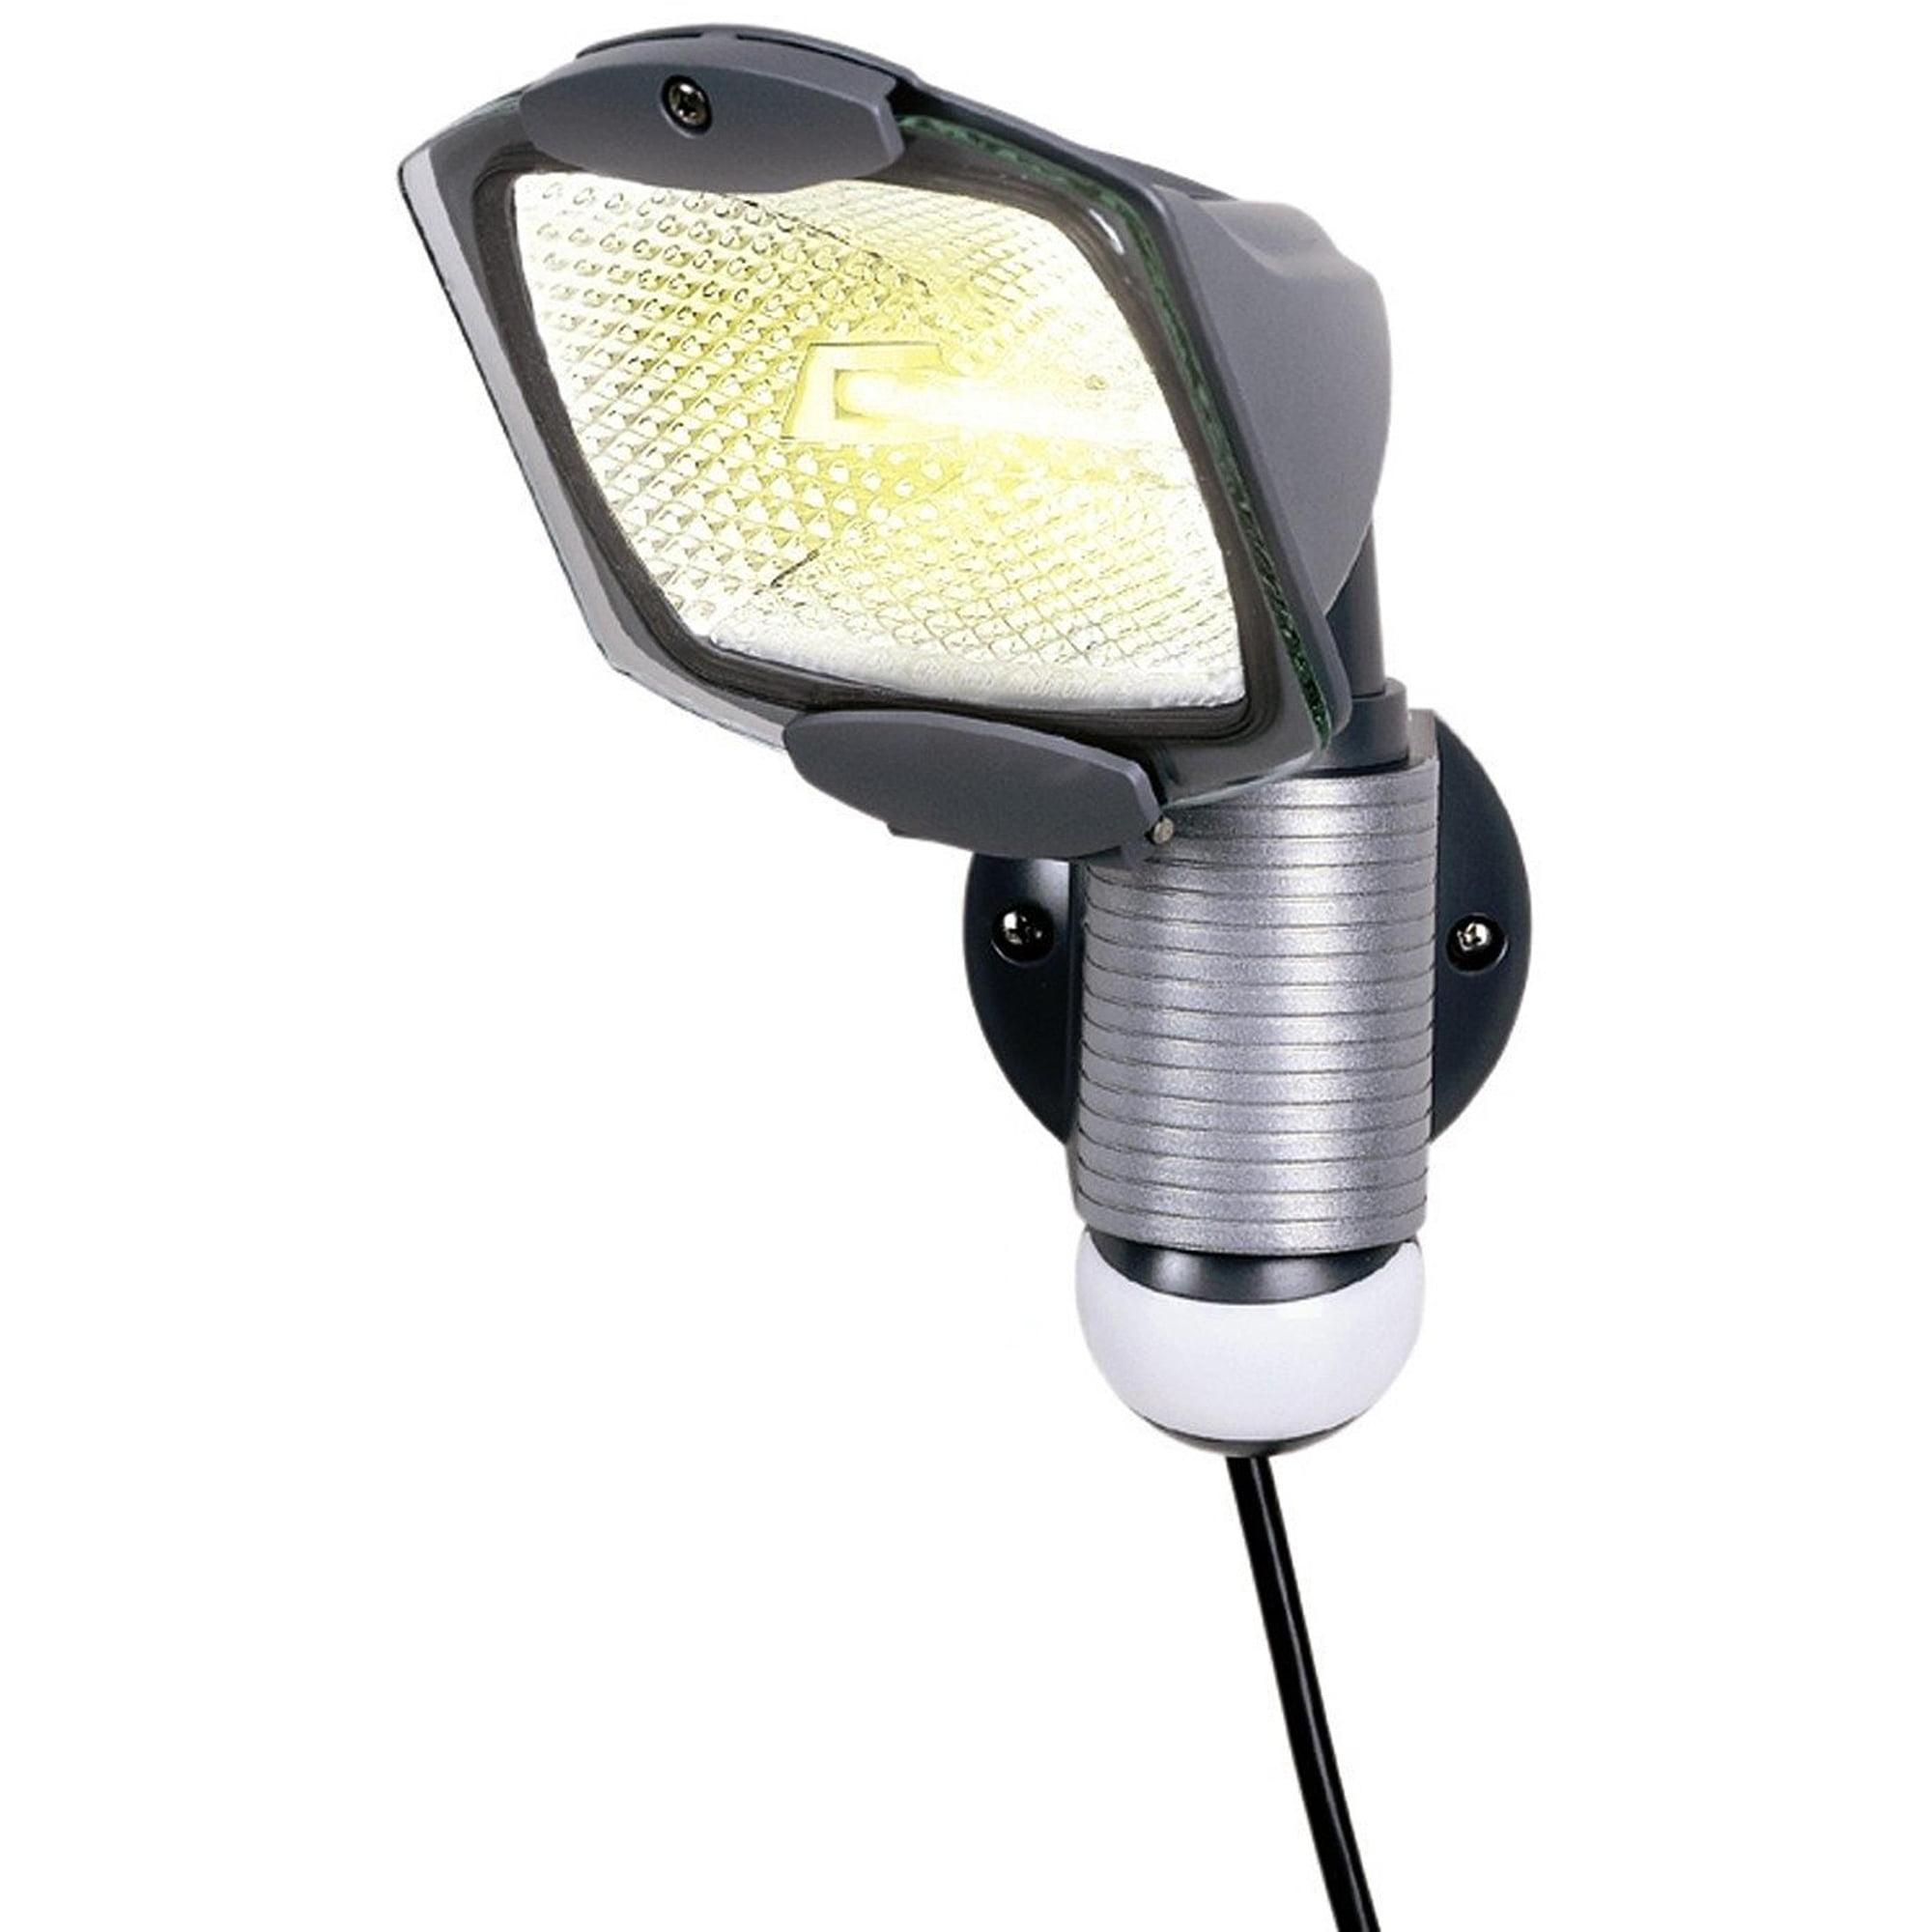 Cooper Lighting/Regent Light 100W Plug-In Motion-Activated Floodlight - Walmart.com